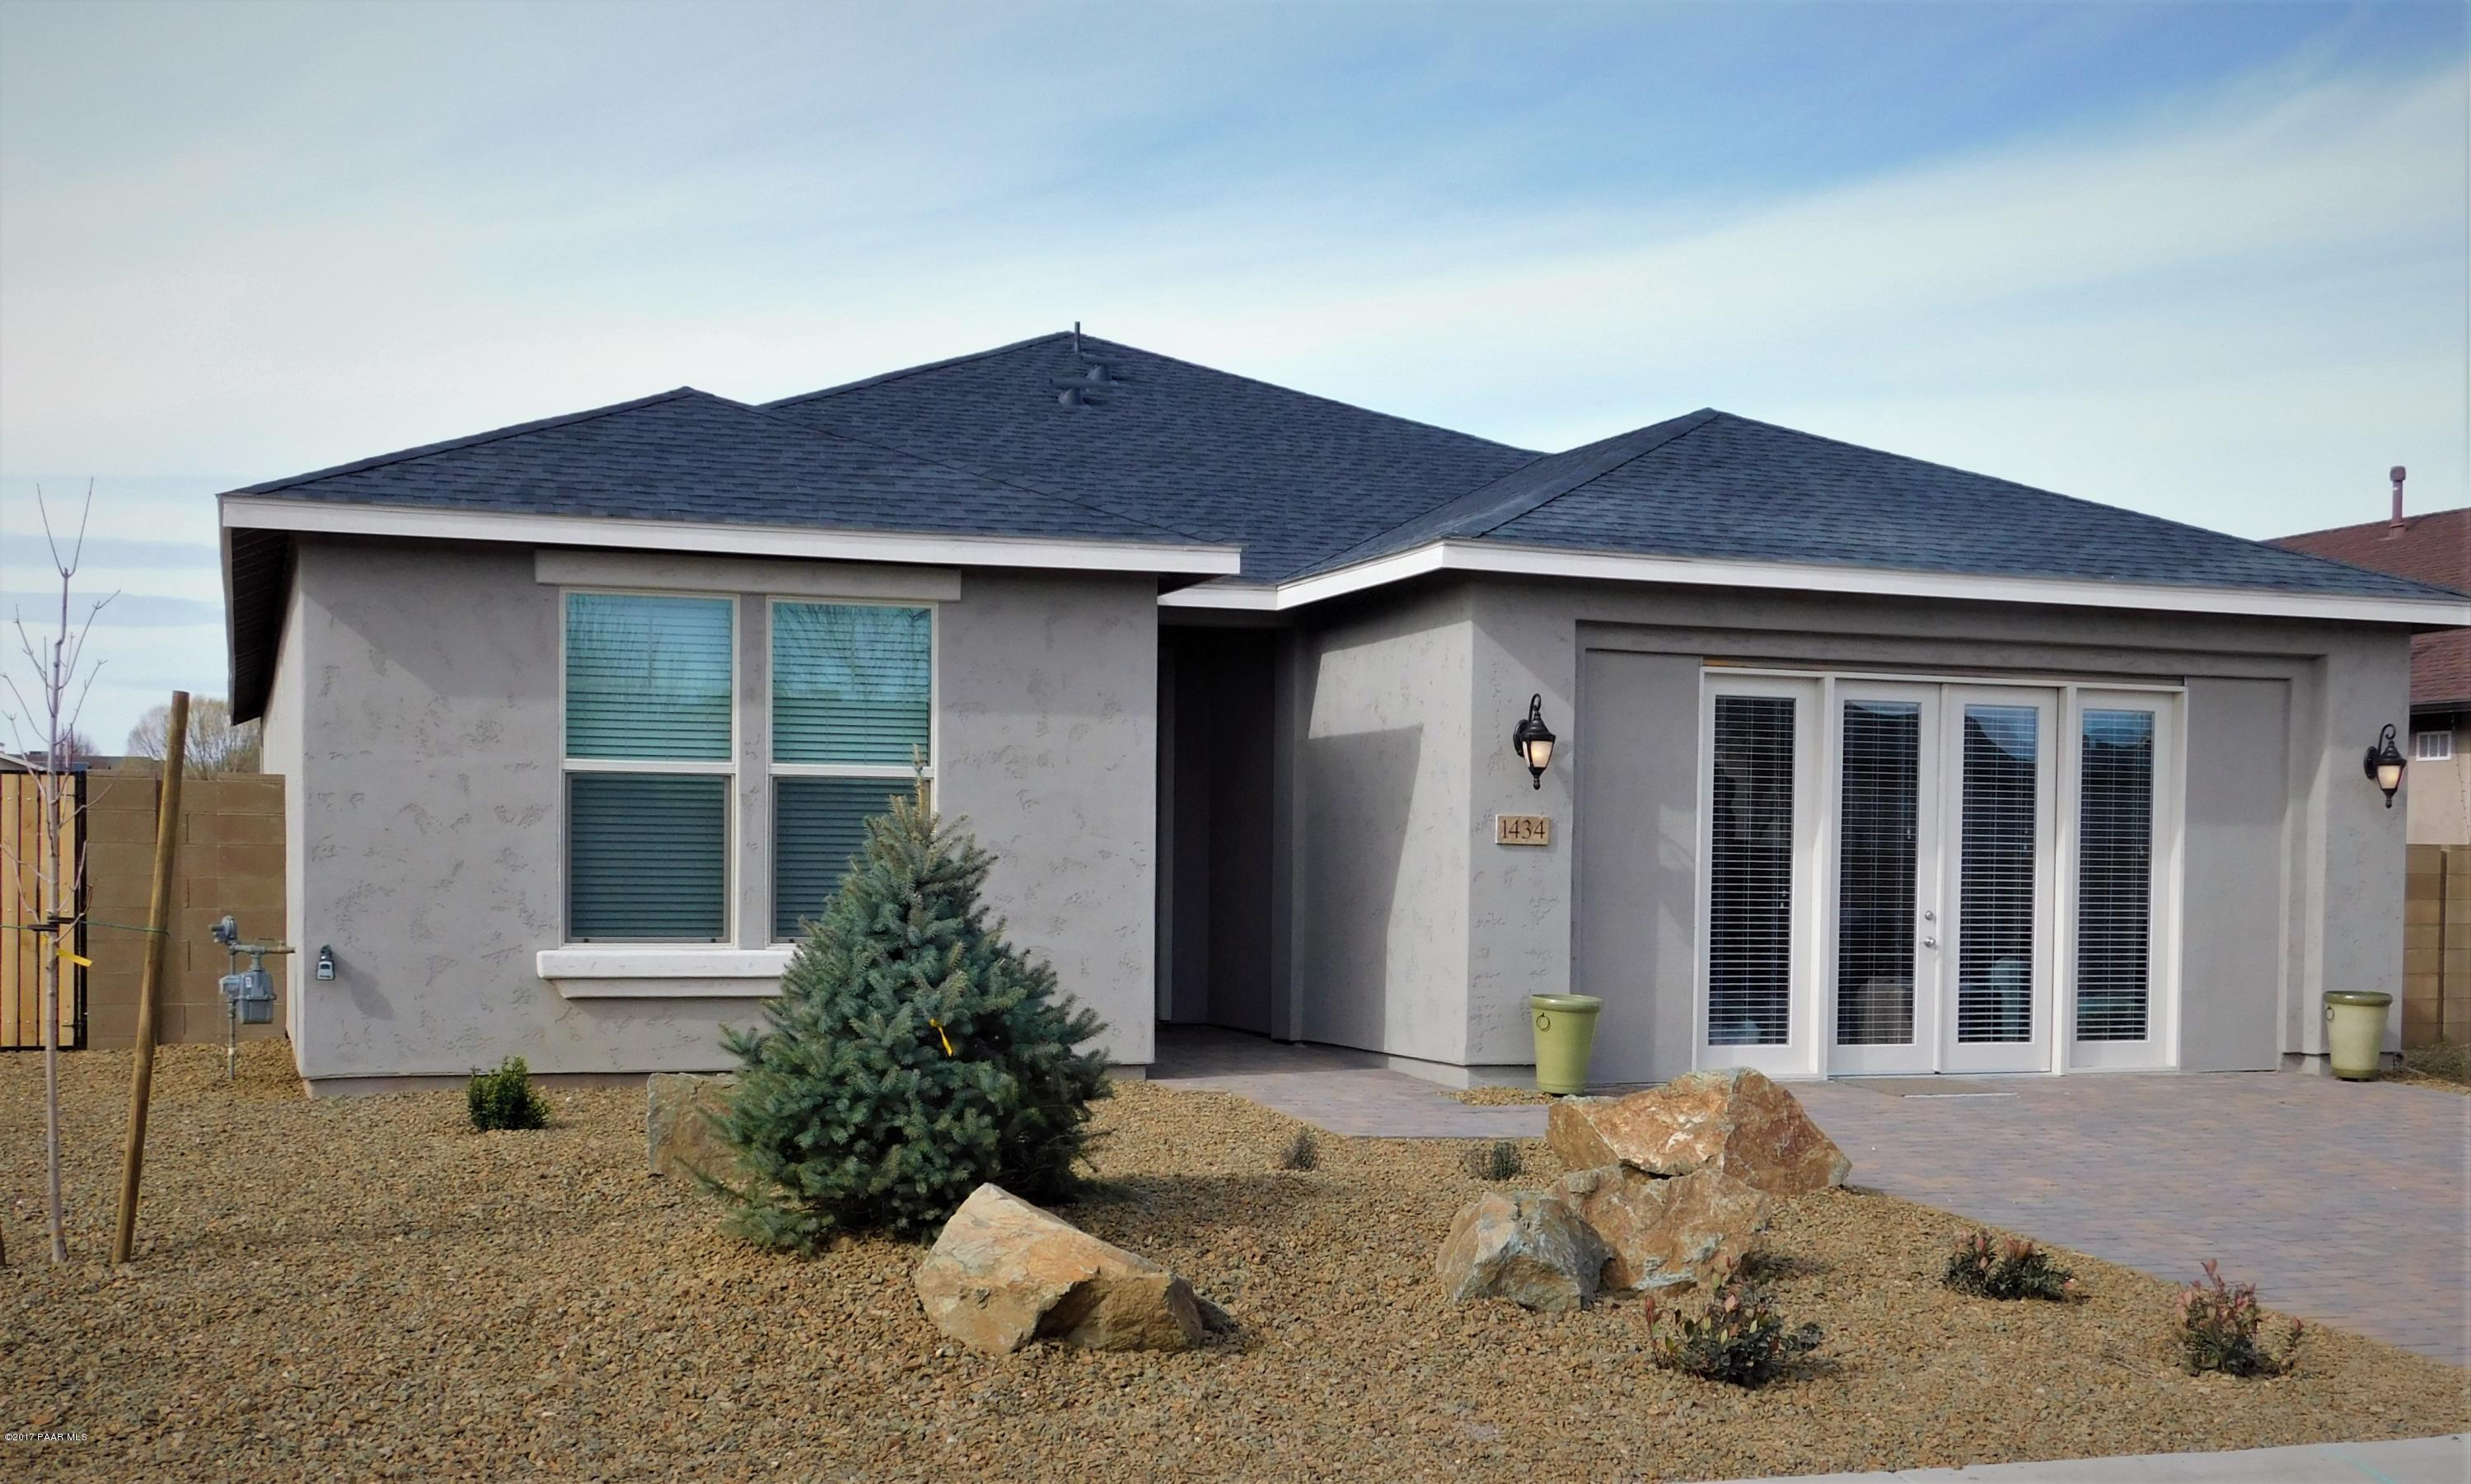 Photo of 1221 Bainbridge, Chino Valley, AZ 86323